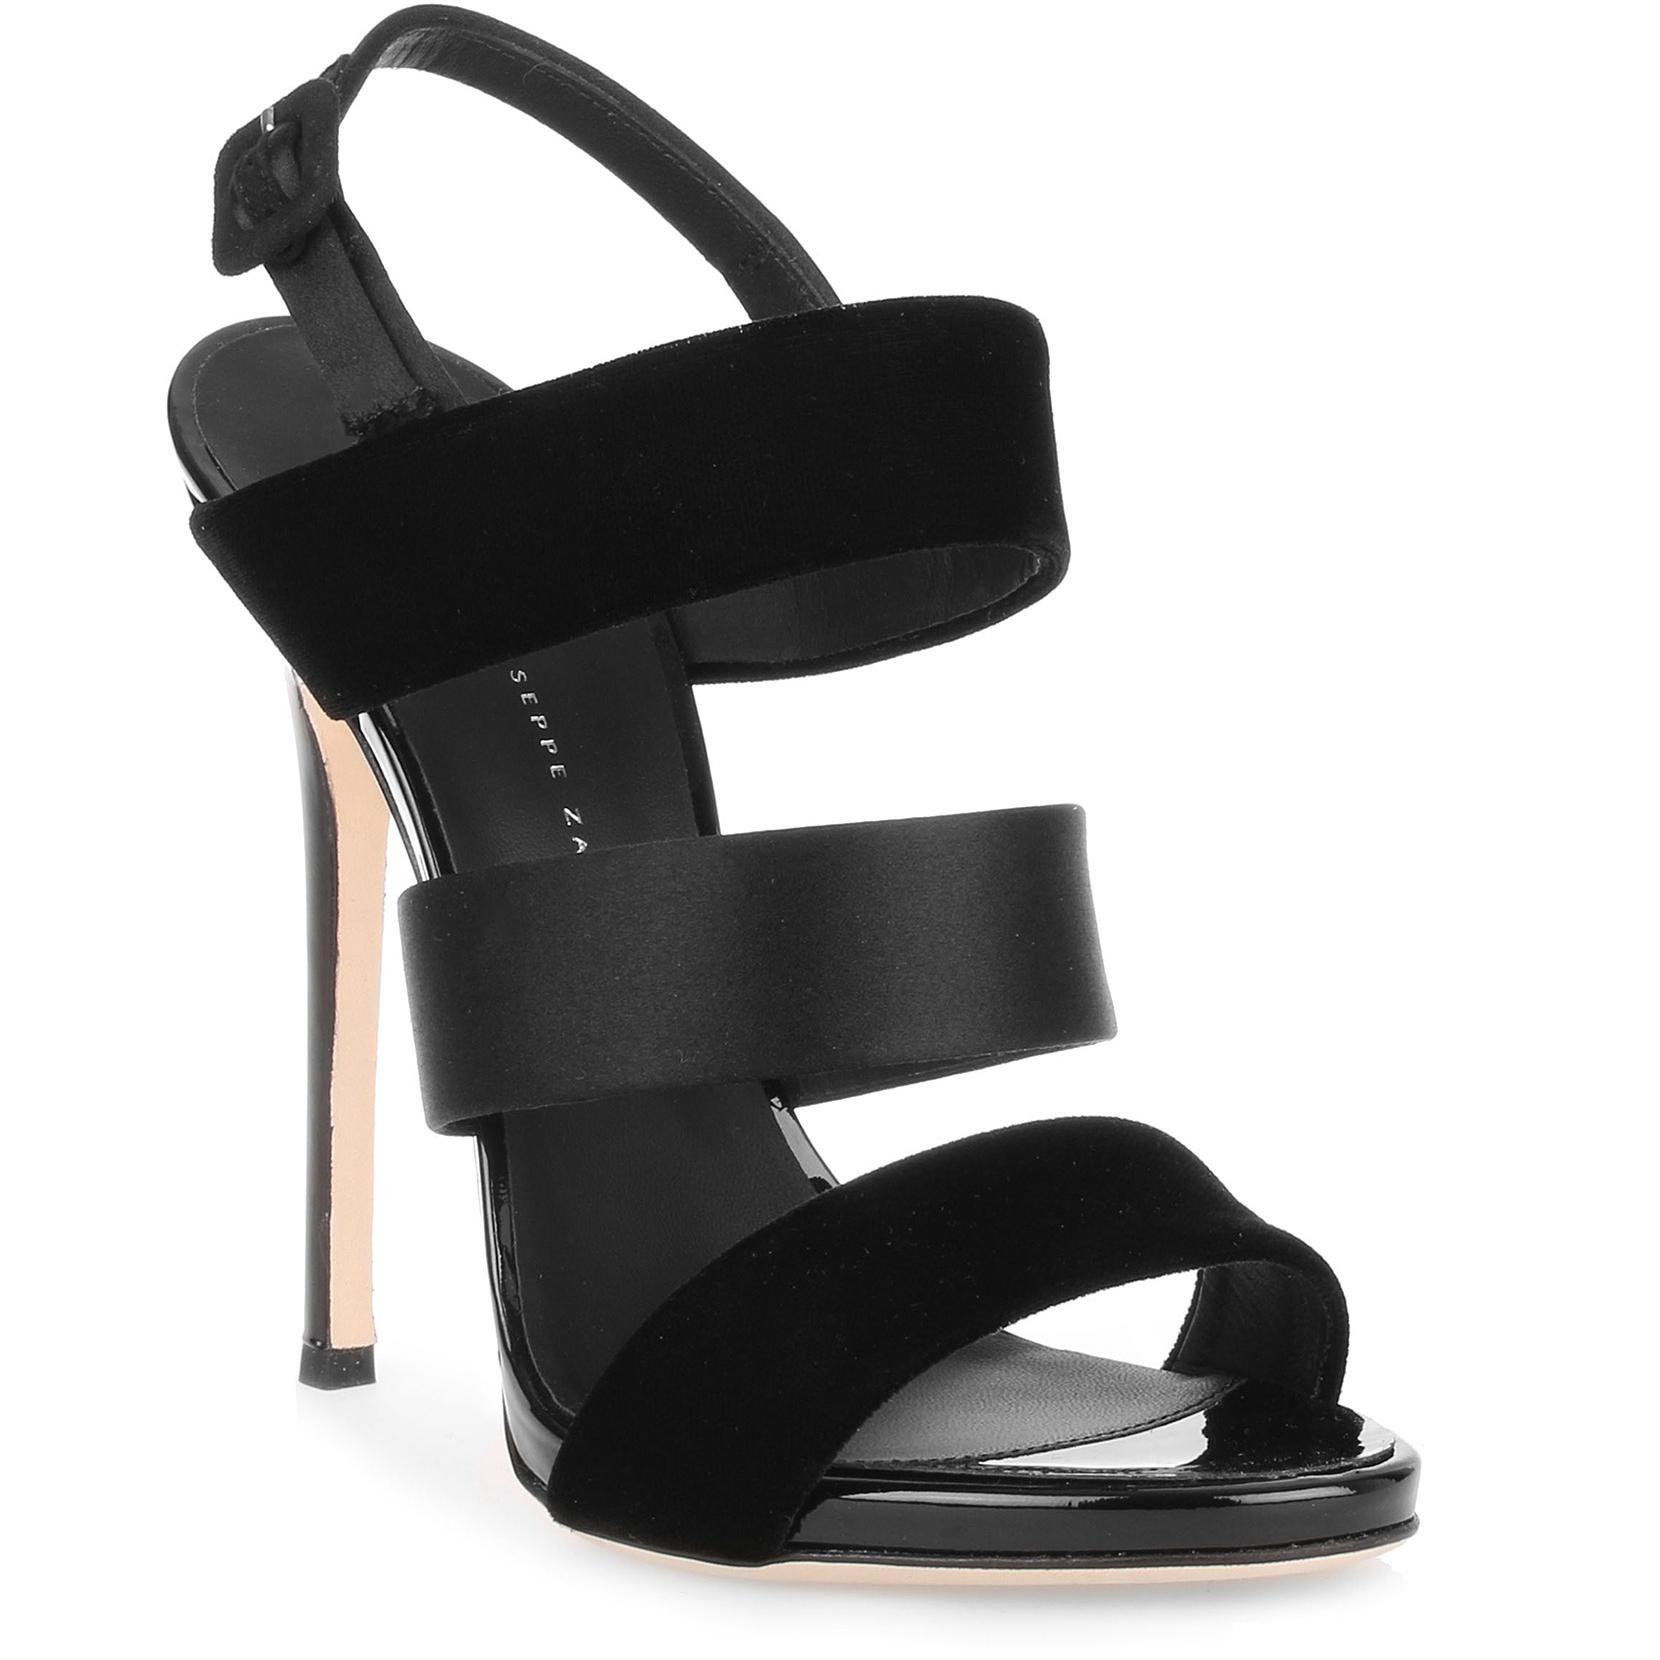 Veronica black velvet satin sandal Giuseppe Zanotti yb20cek